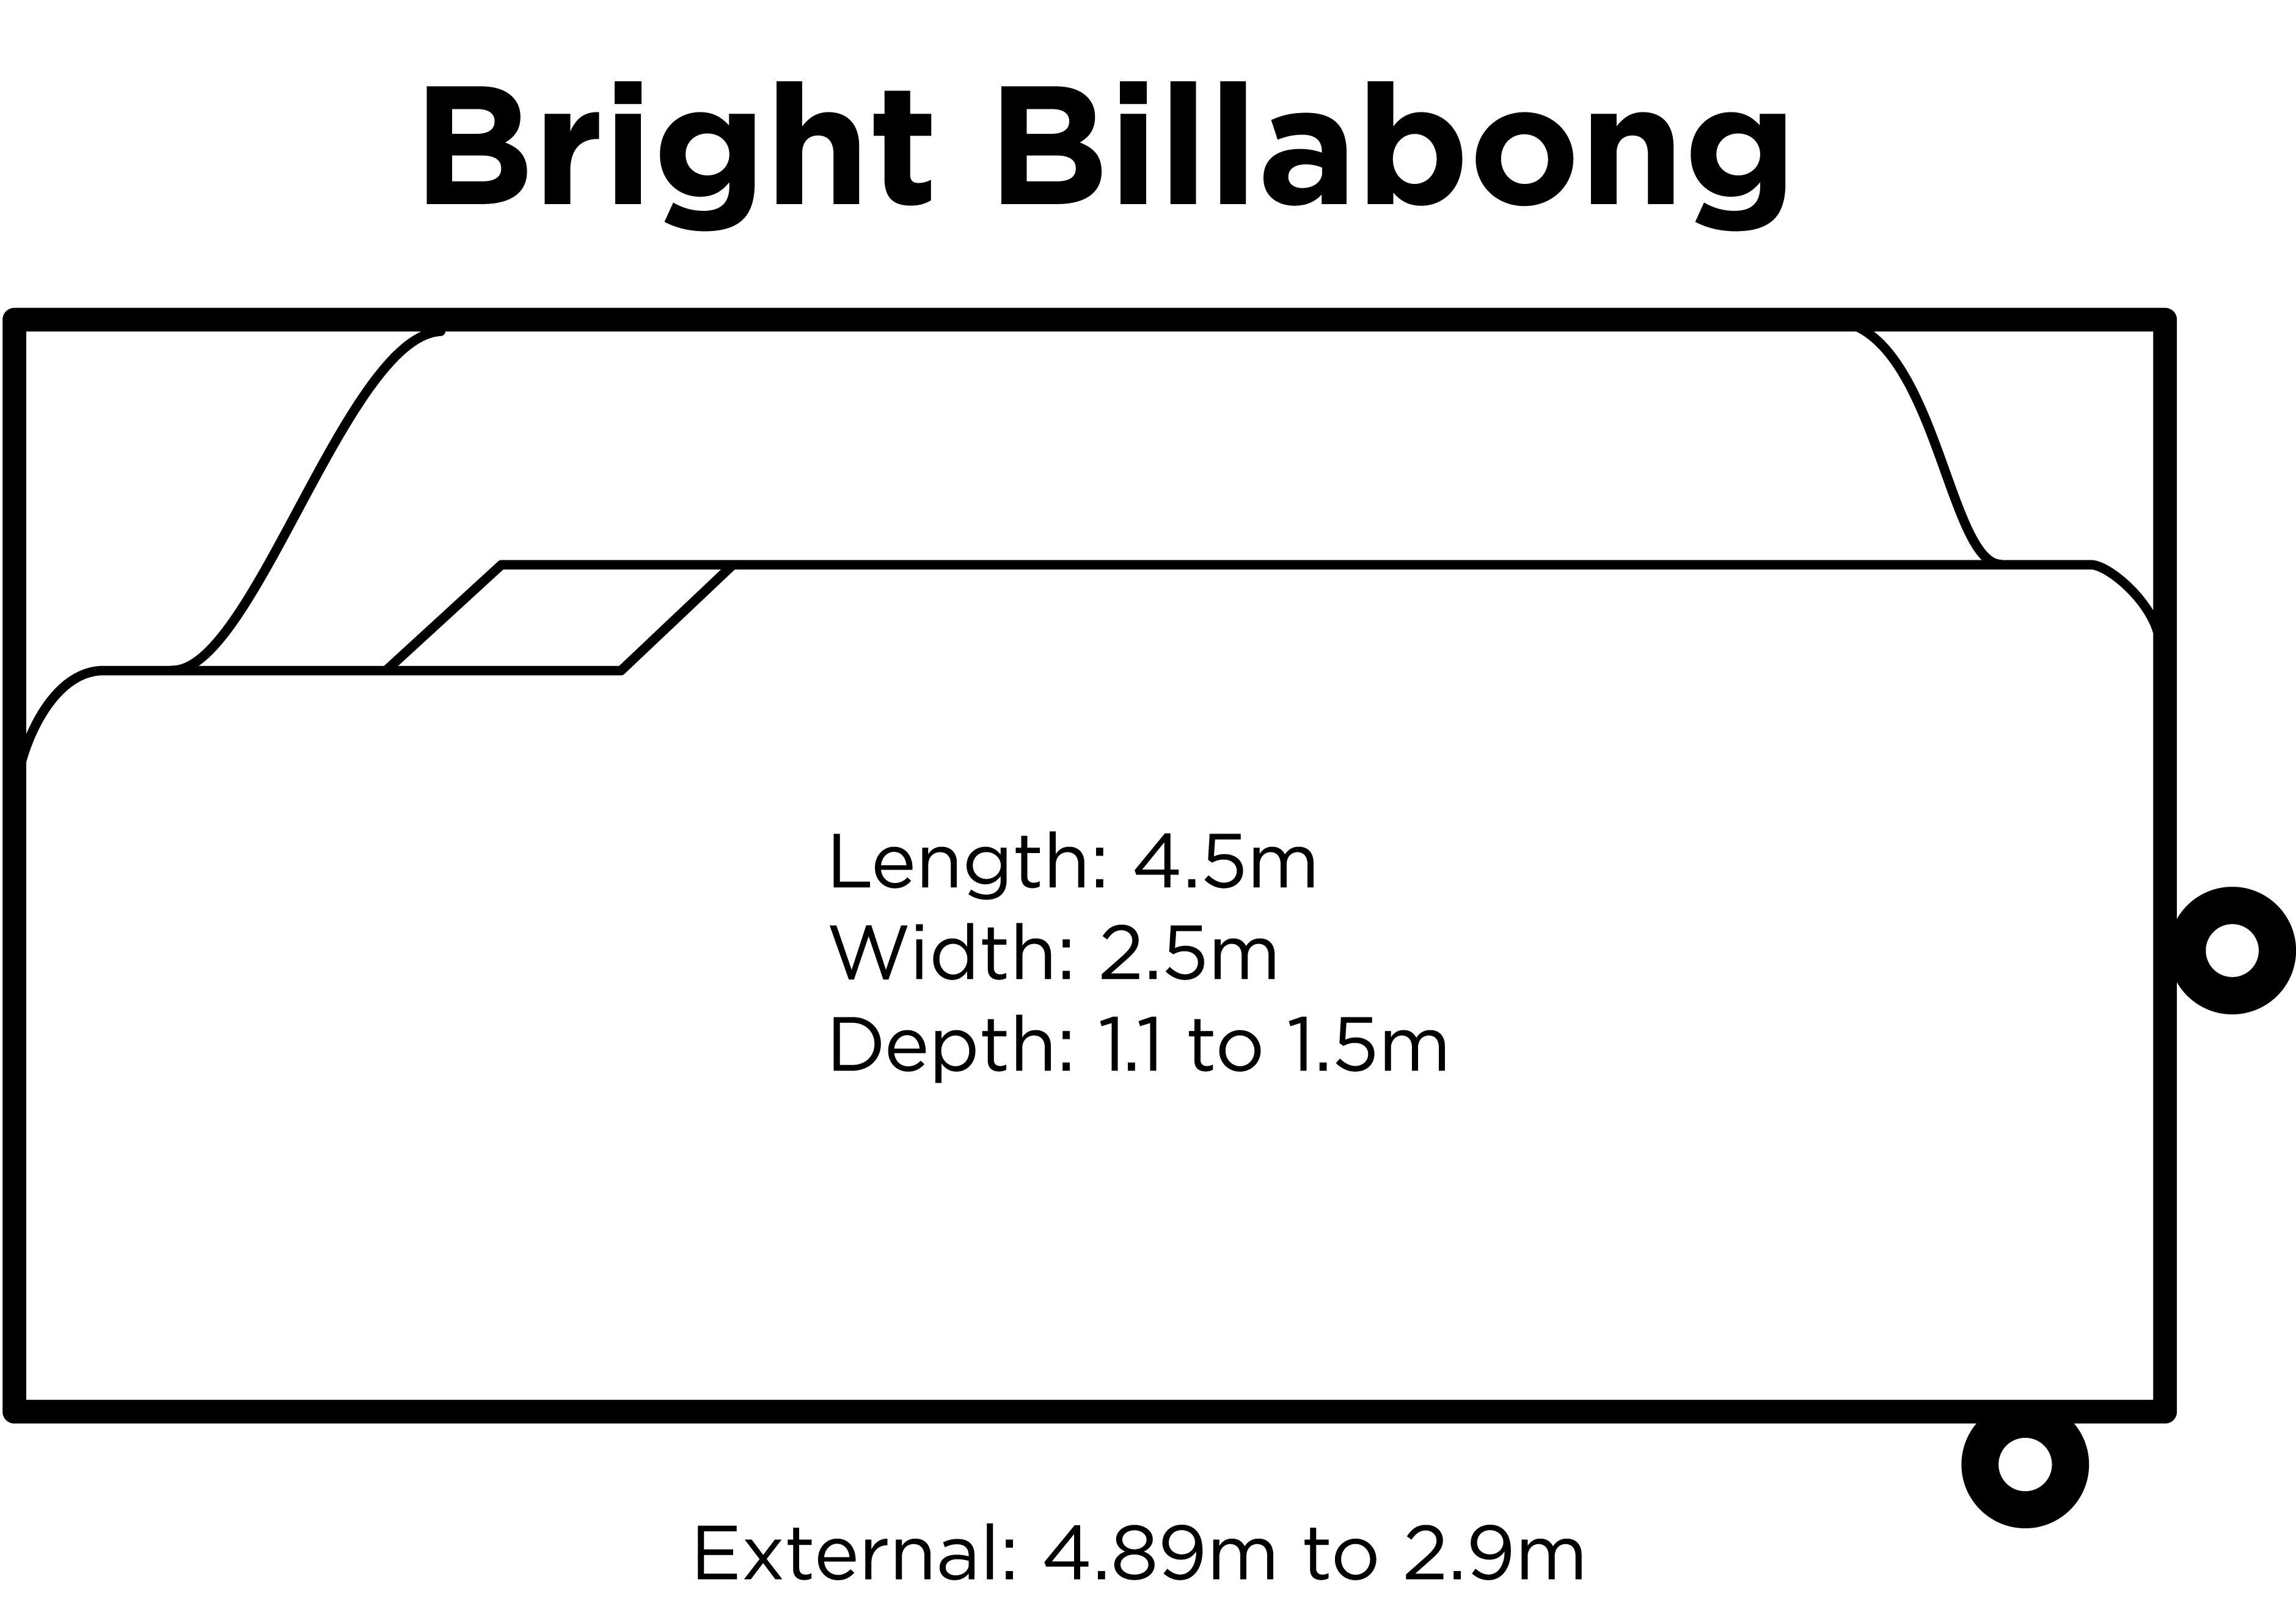 Bright Billabong